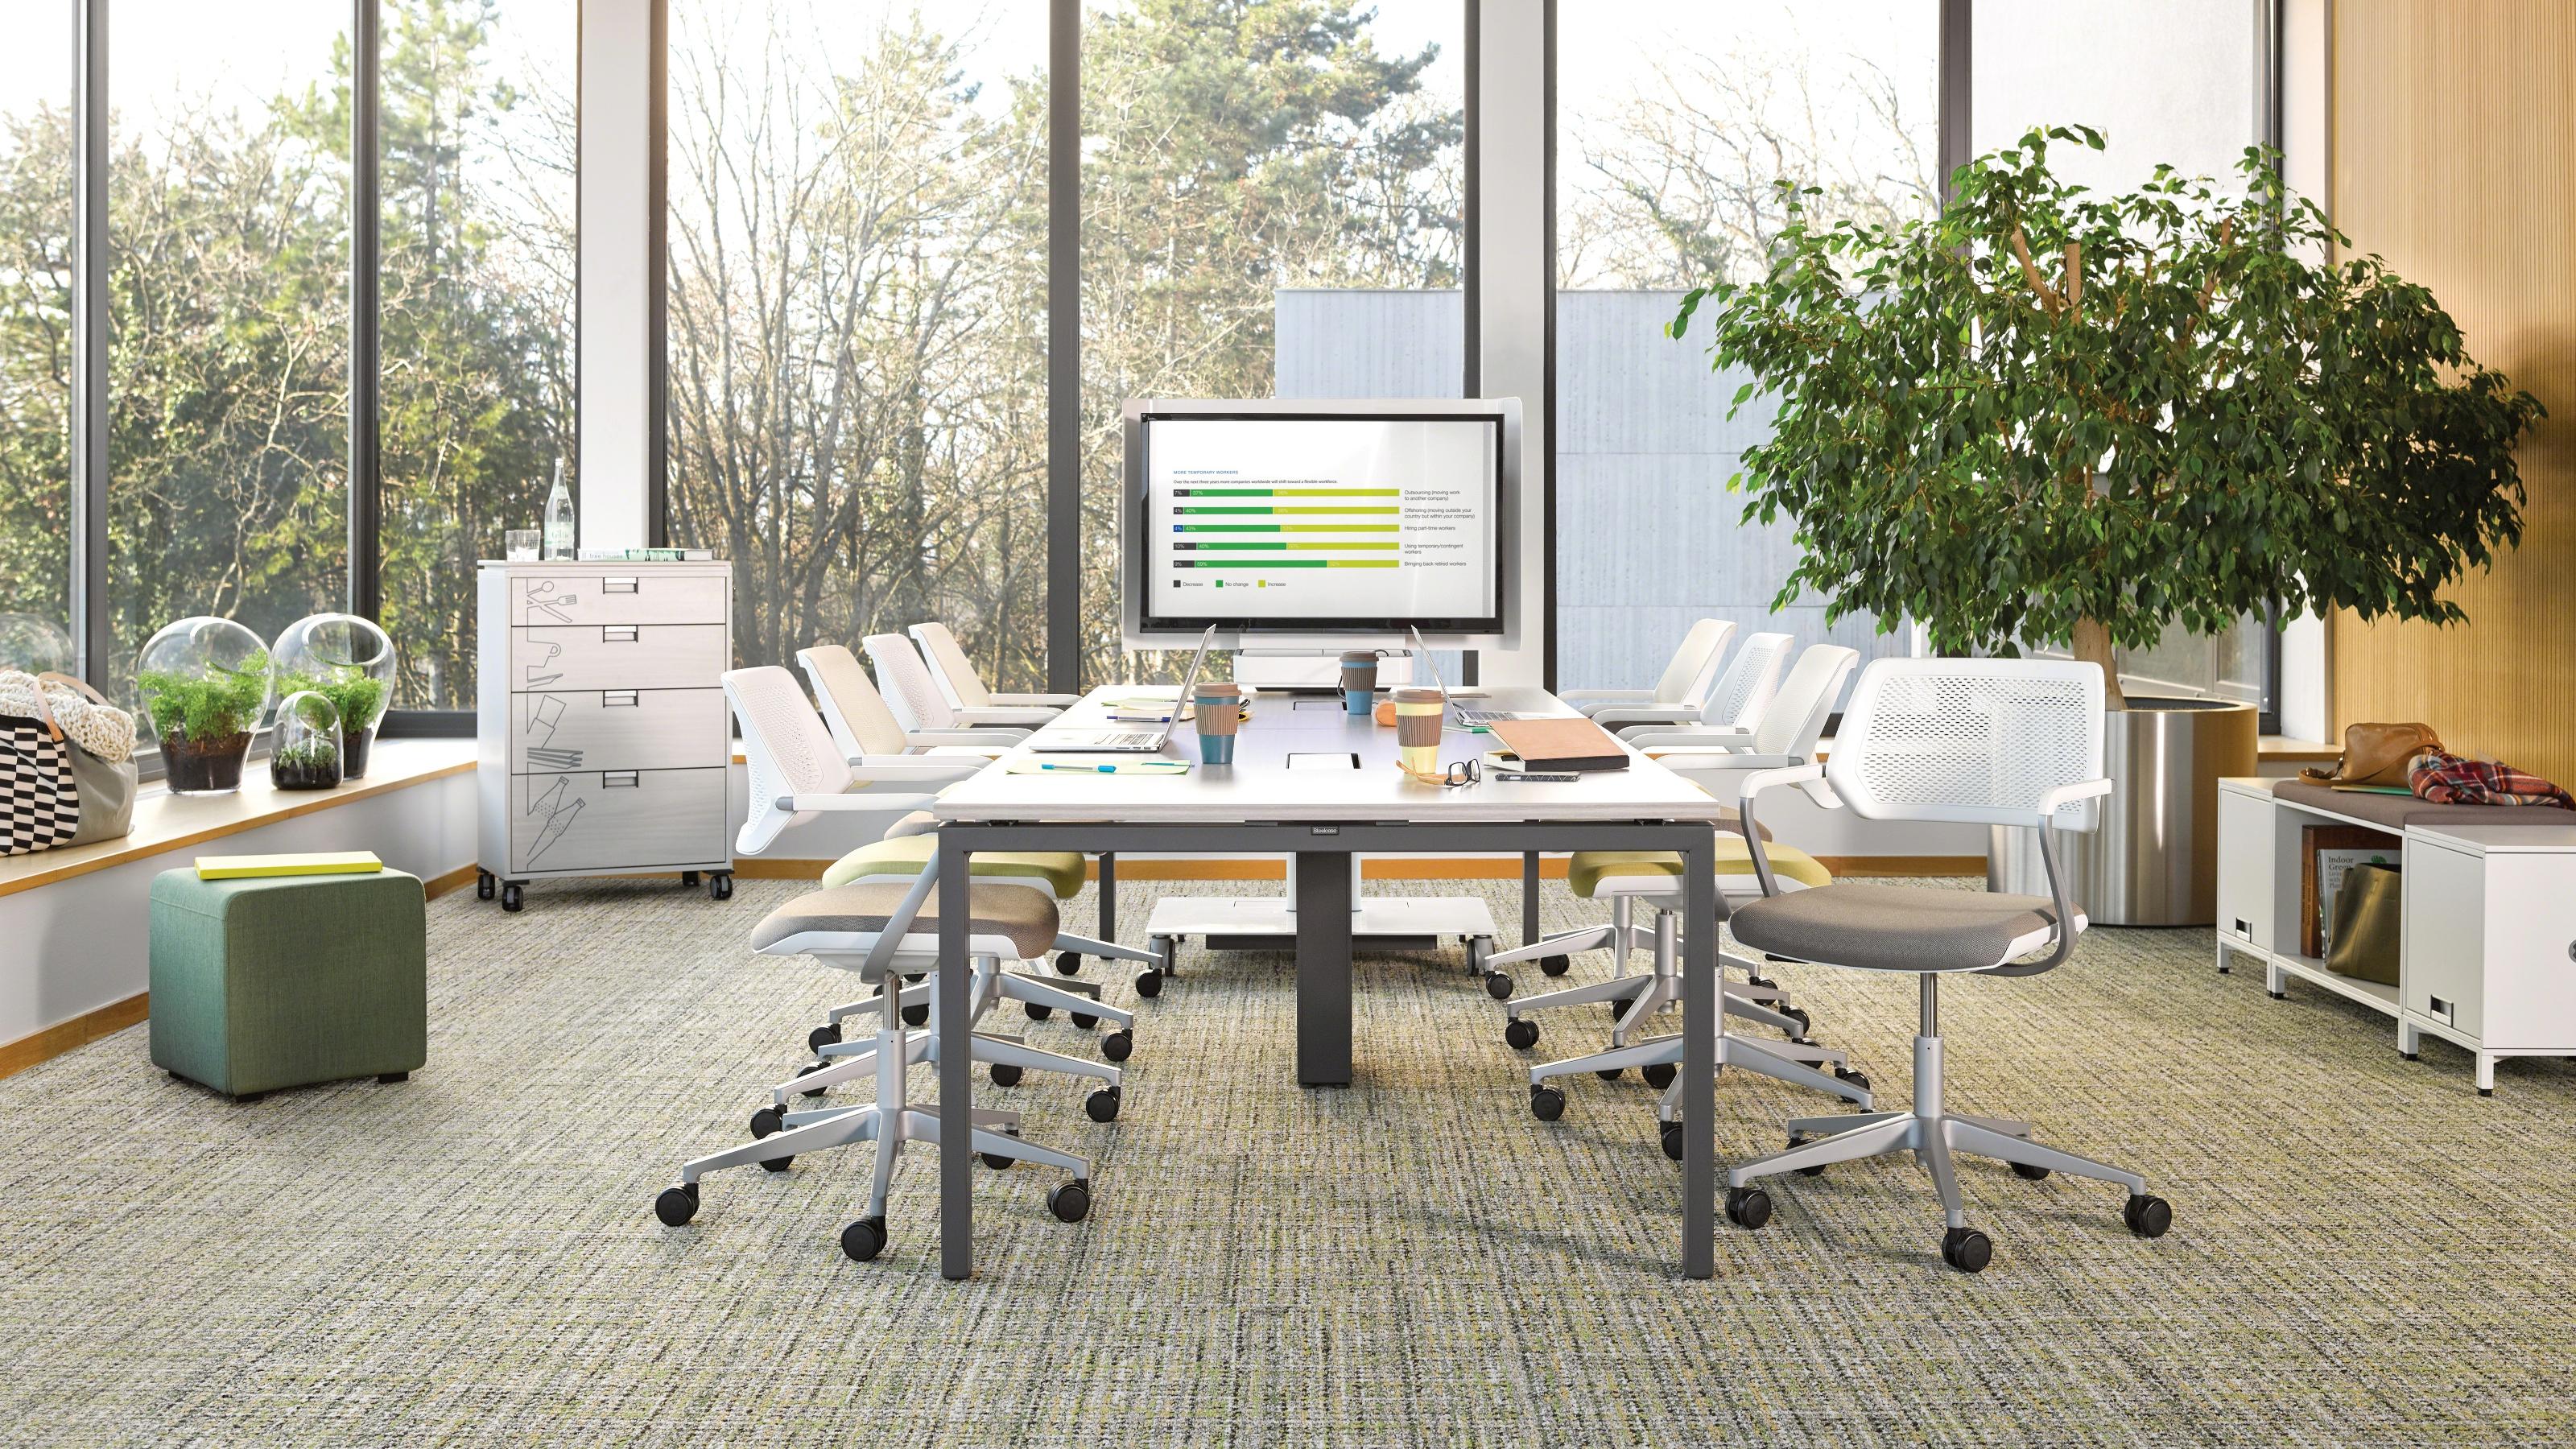 Amazing 30 Steelcase Office Furniture Decorating Design